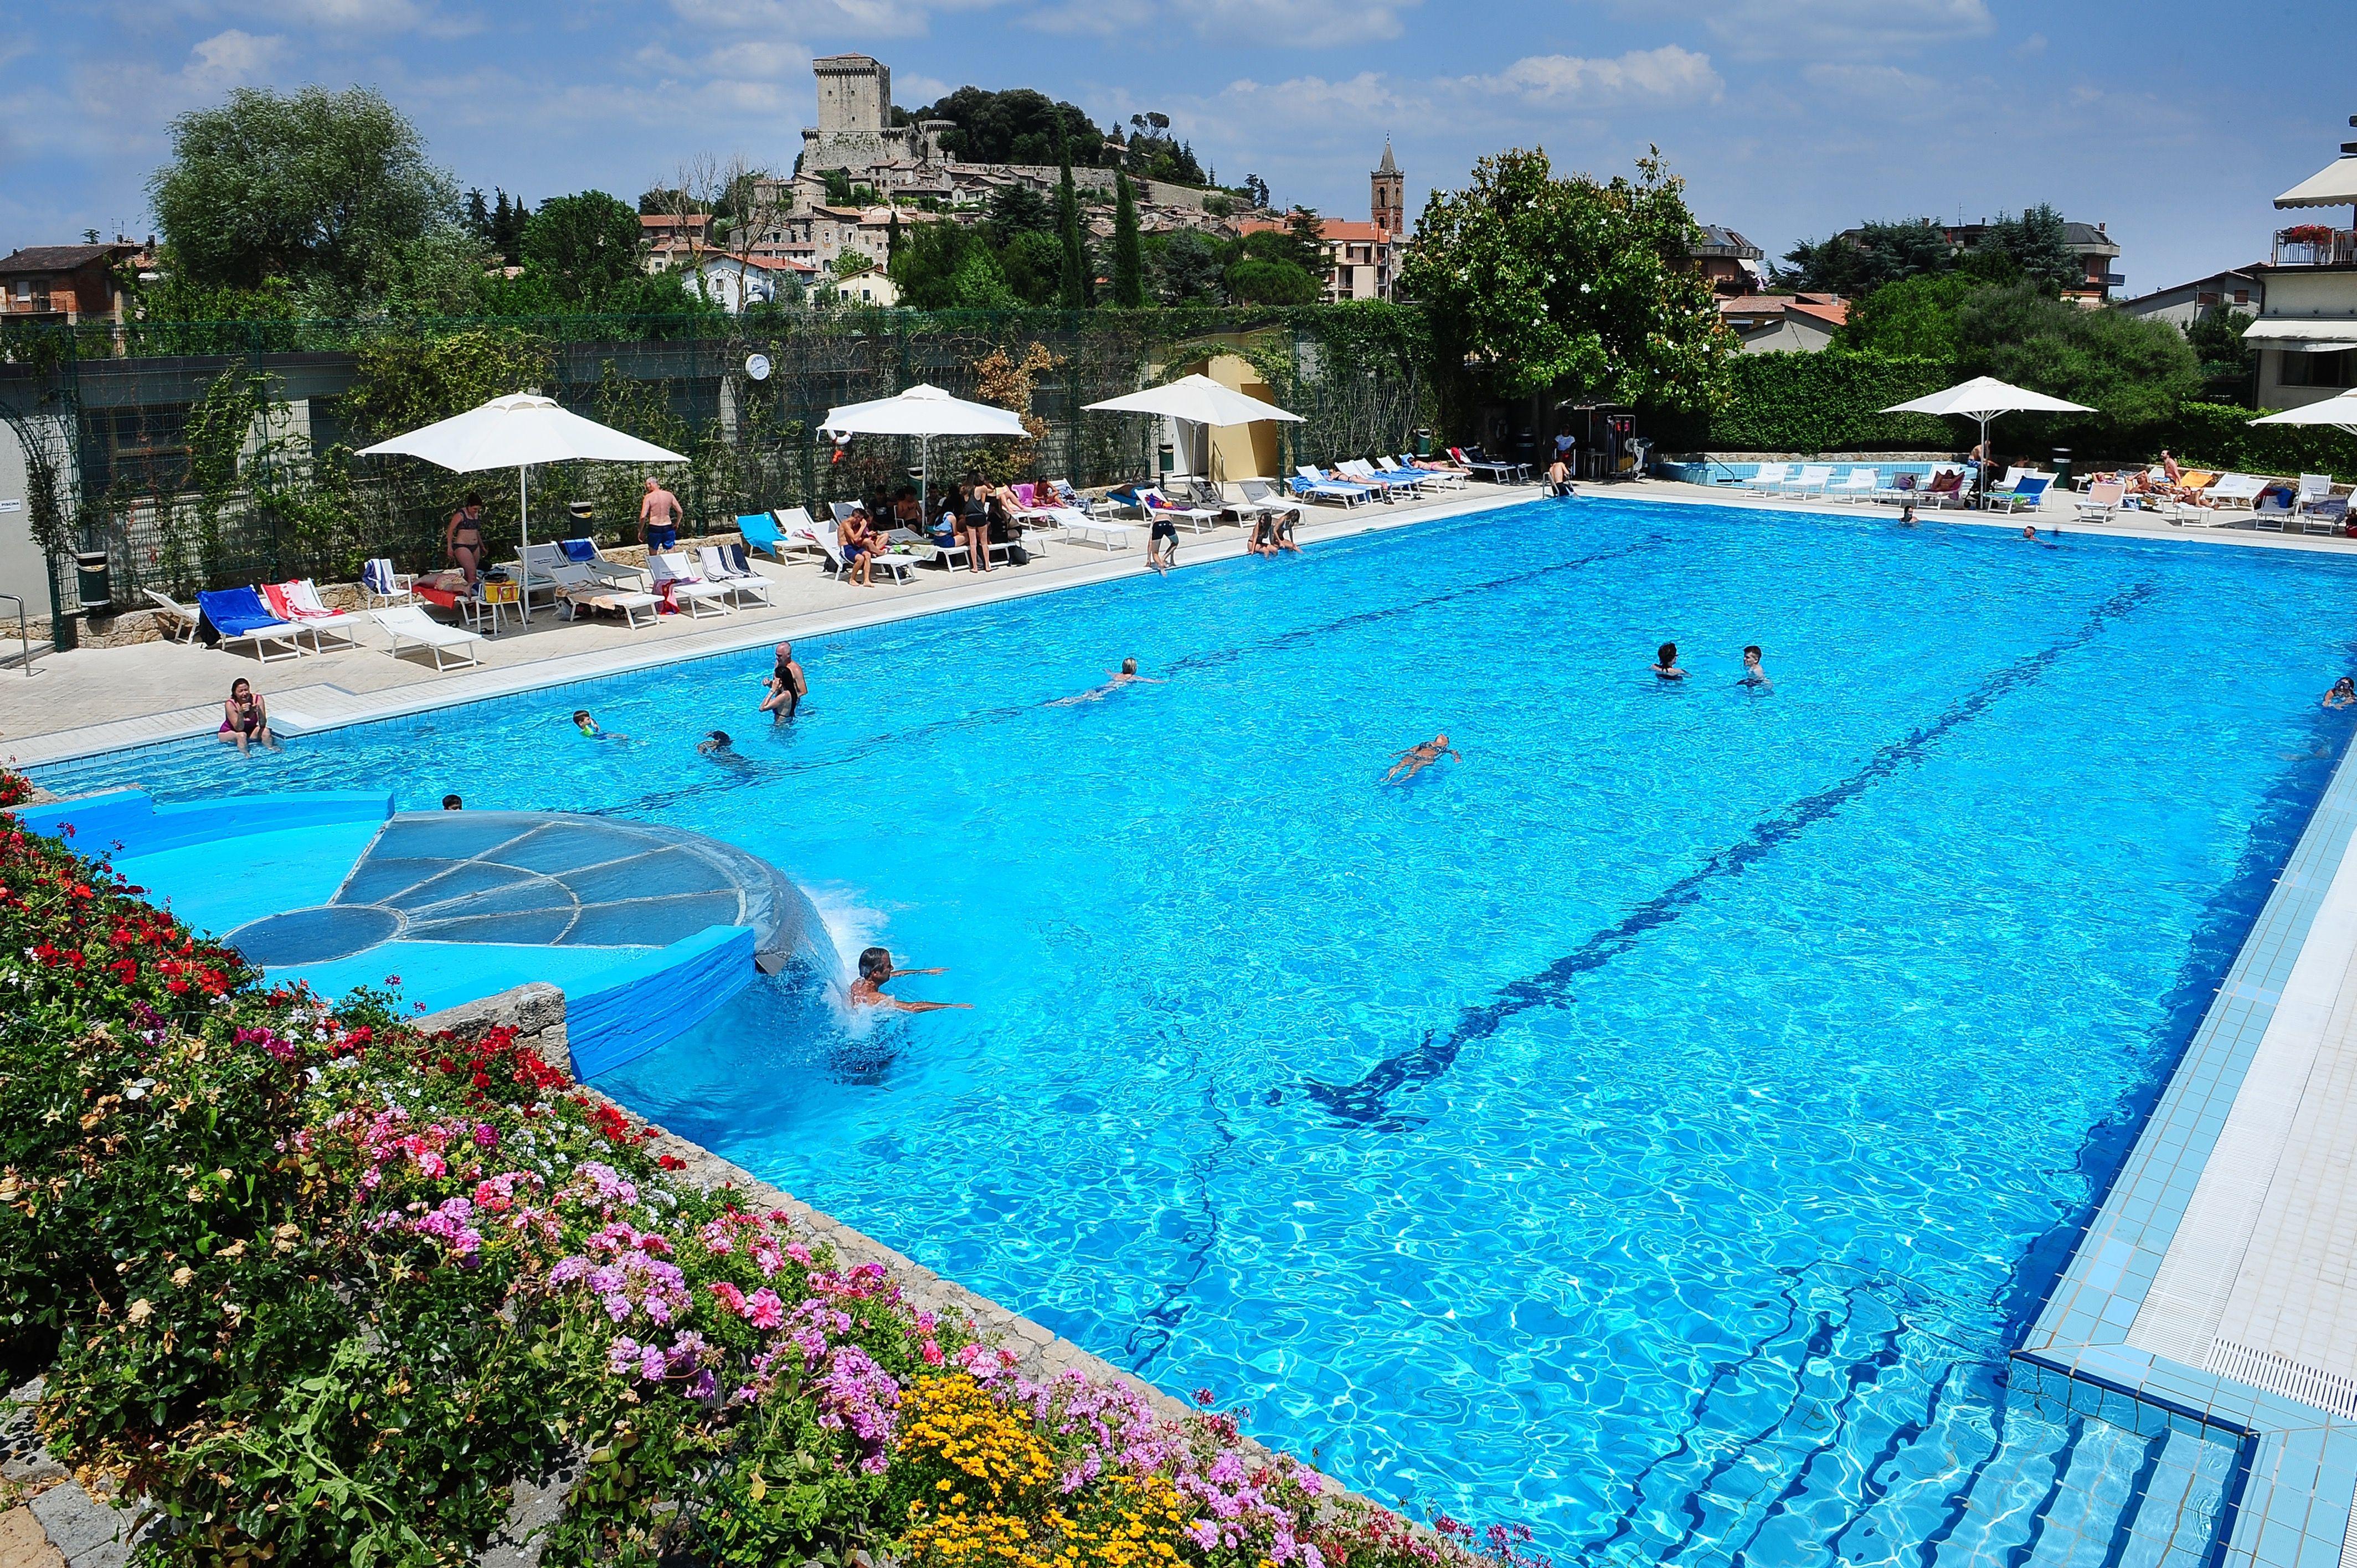 Campeggio parco delle piscine toscana camping sarteano - Piscine in toscana ...